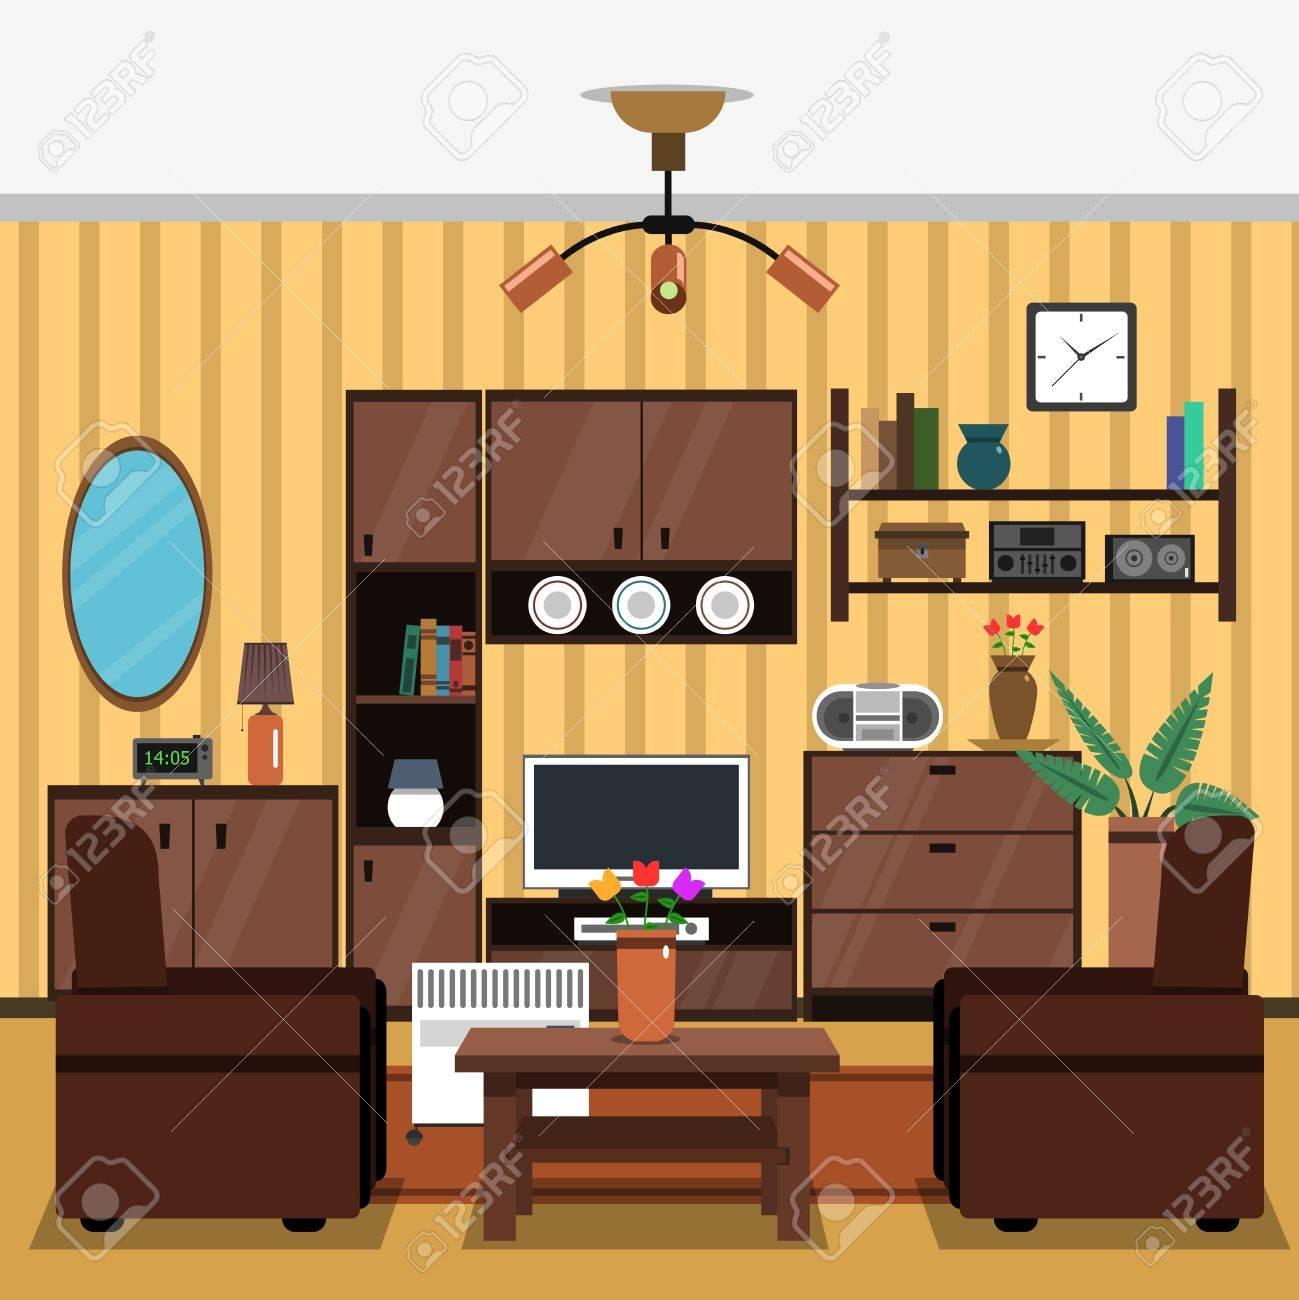 Muebles Para Planas. Muebles Para Tv Plantas Led Flores With Muebles ...